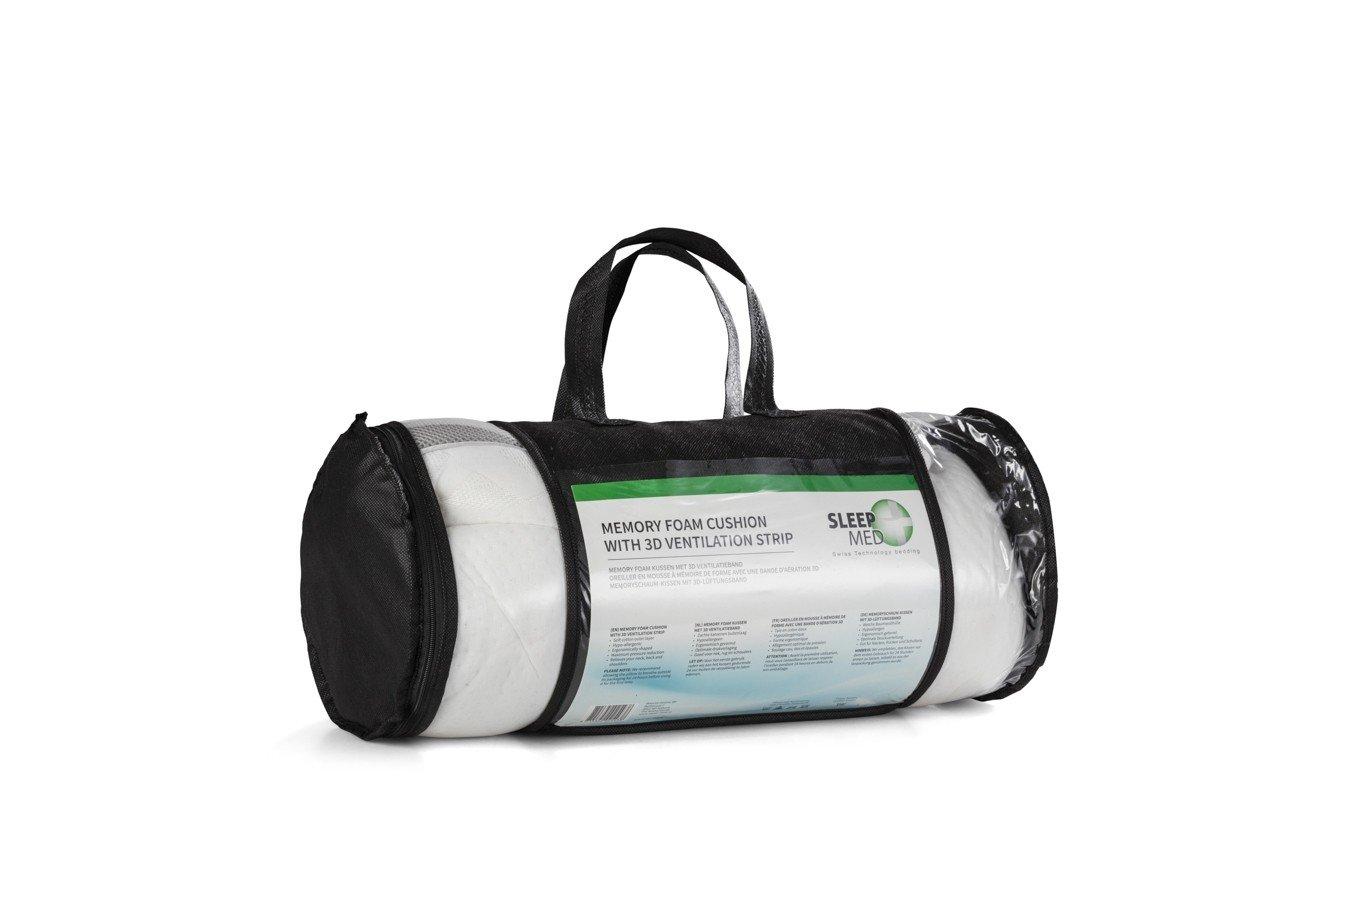 Sleep Med Kussen : Sleepmed pillow with d ventilation strip memory foam white